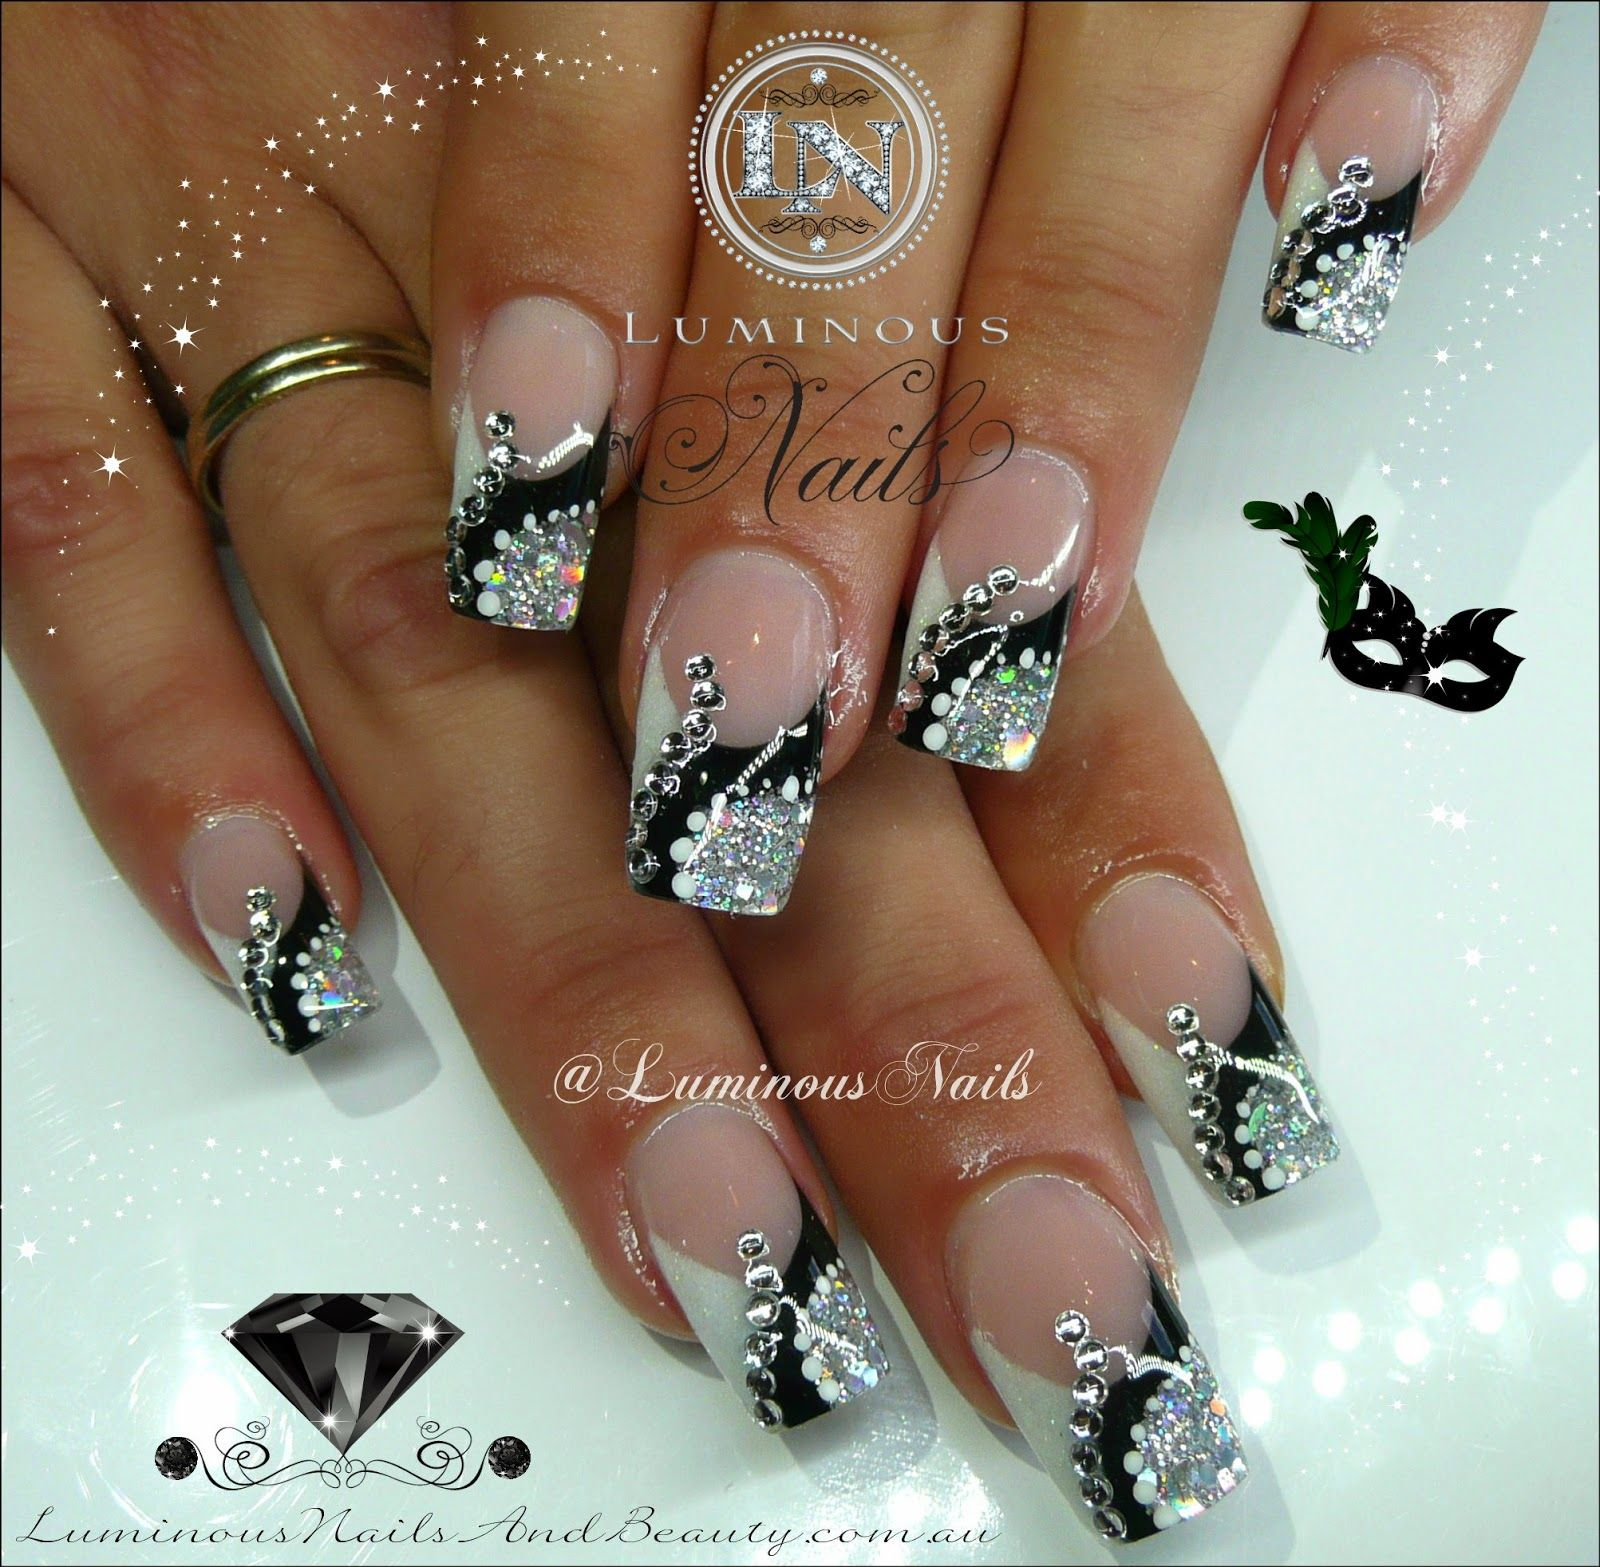 Silver Nail Art Designs: Luminous Nails: Black, Silver & White Nails With Bling